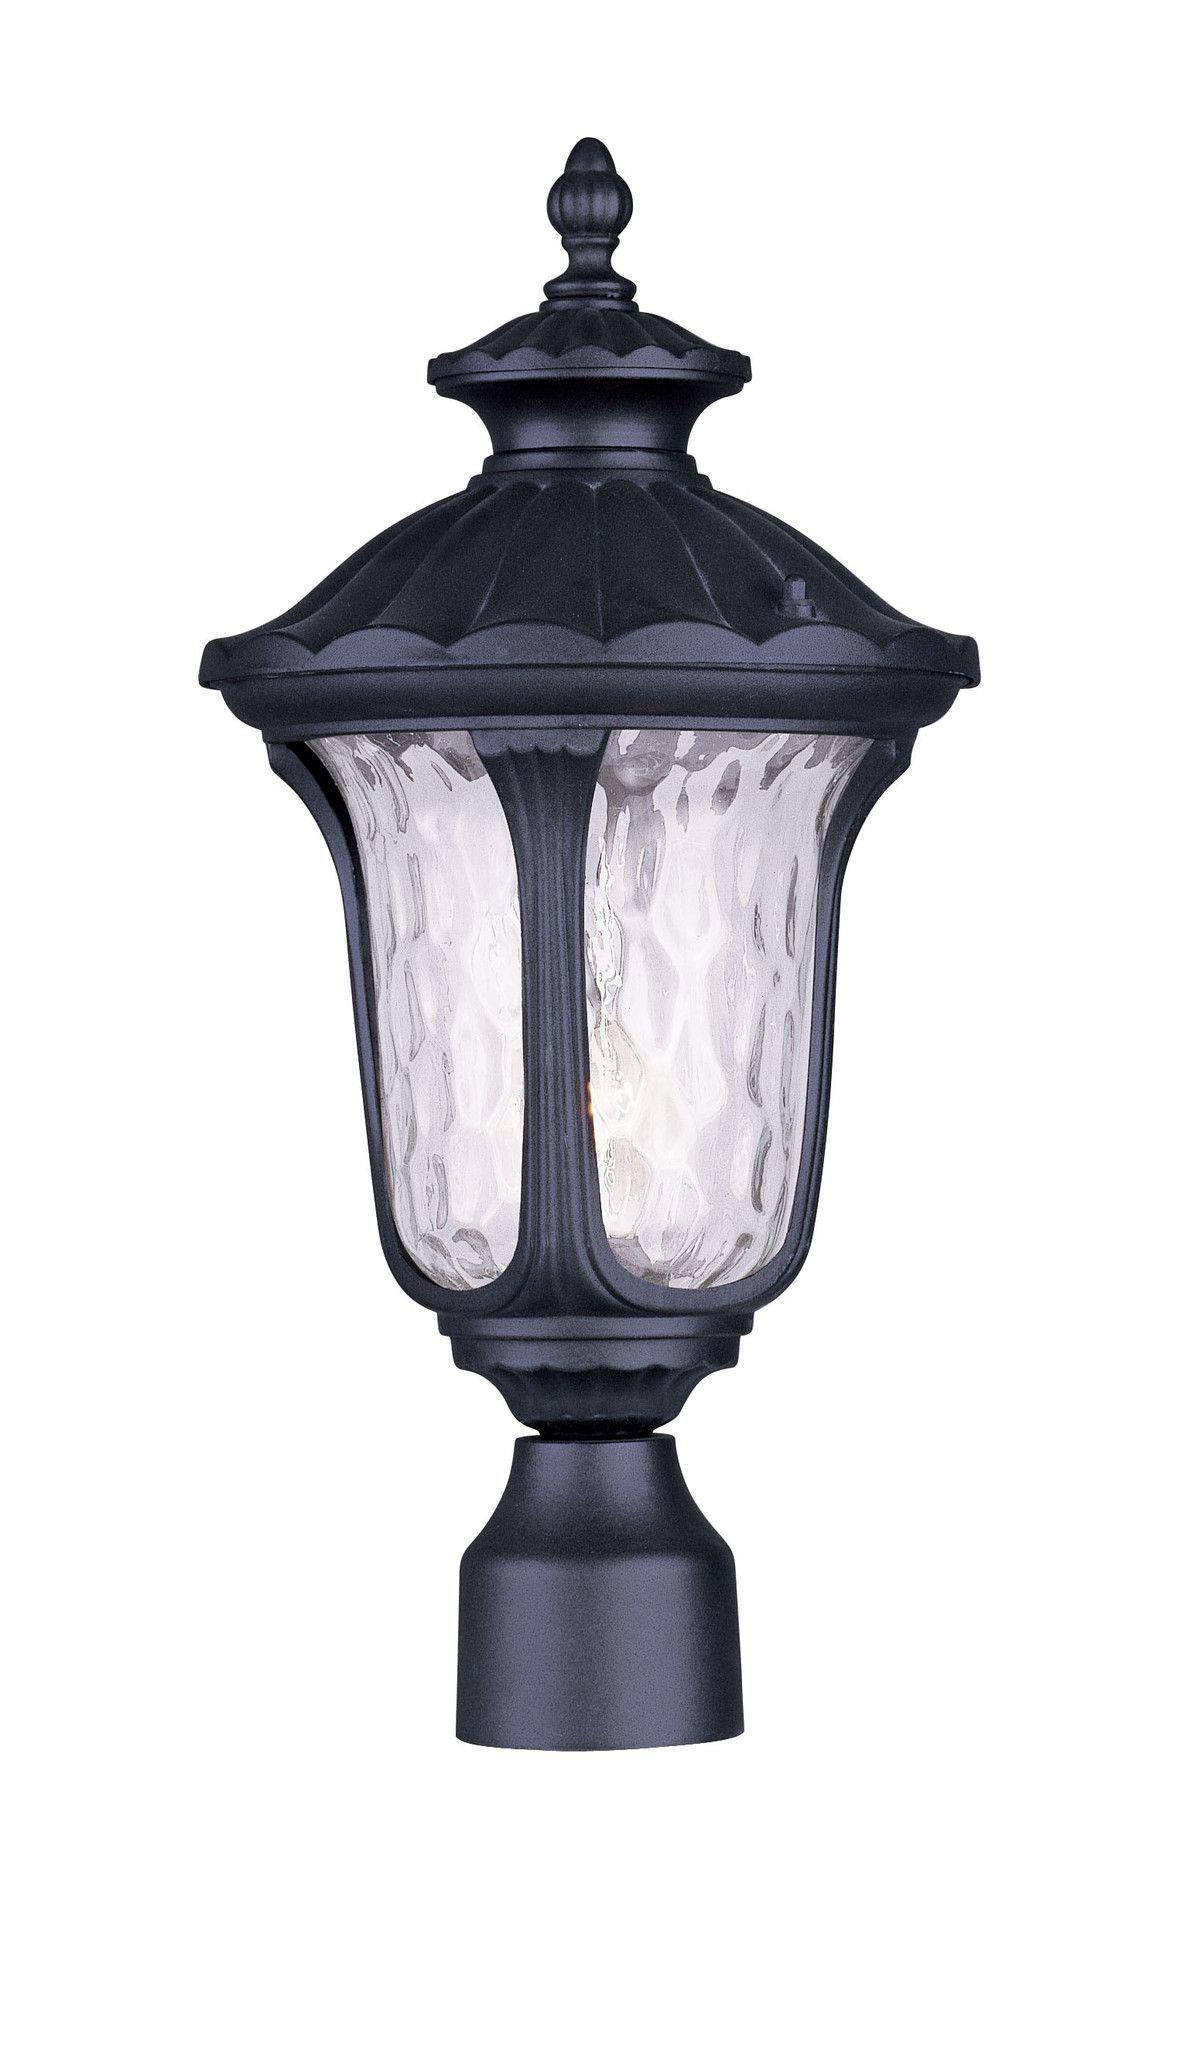 Livex Lighting 7855 04 Oxford Post Mount Black Outdoor Post Lights Post Lights Livex Lighting